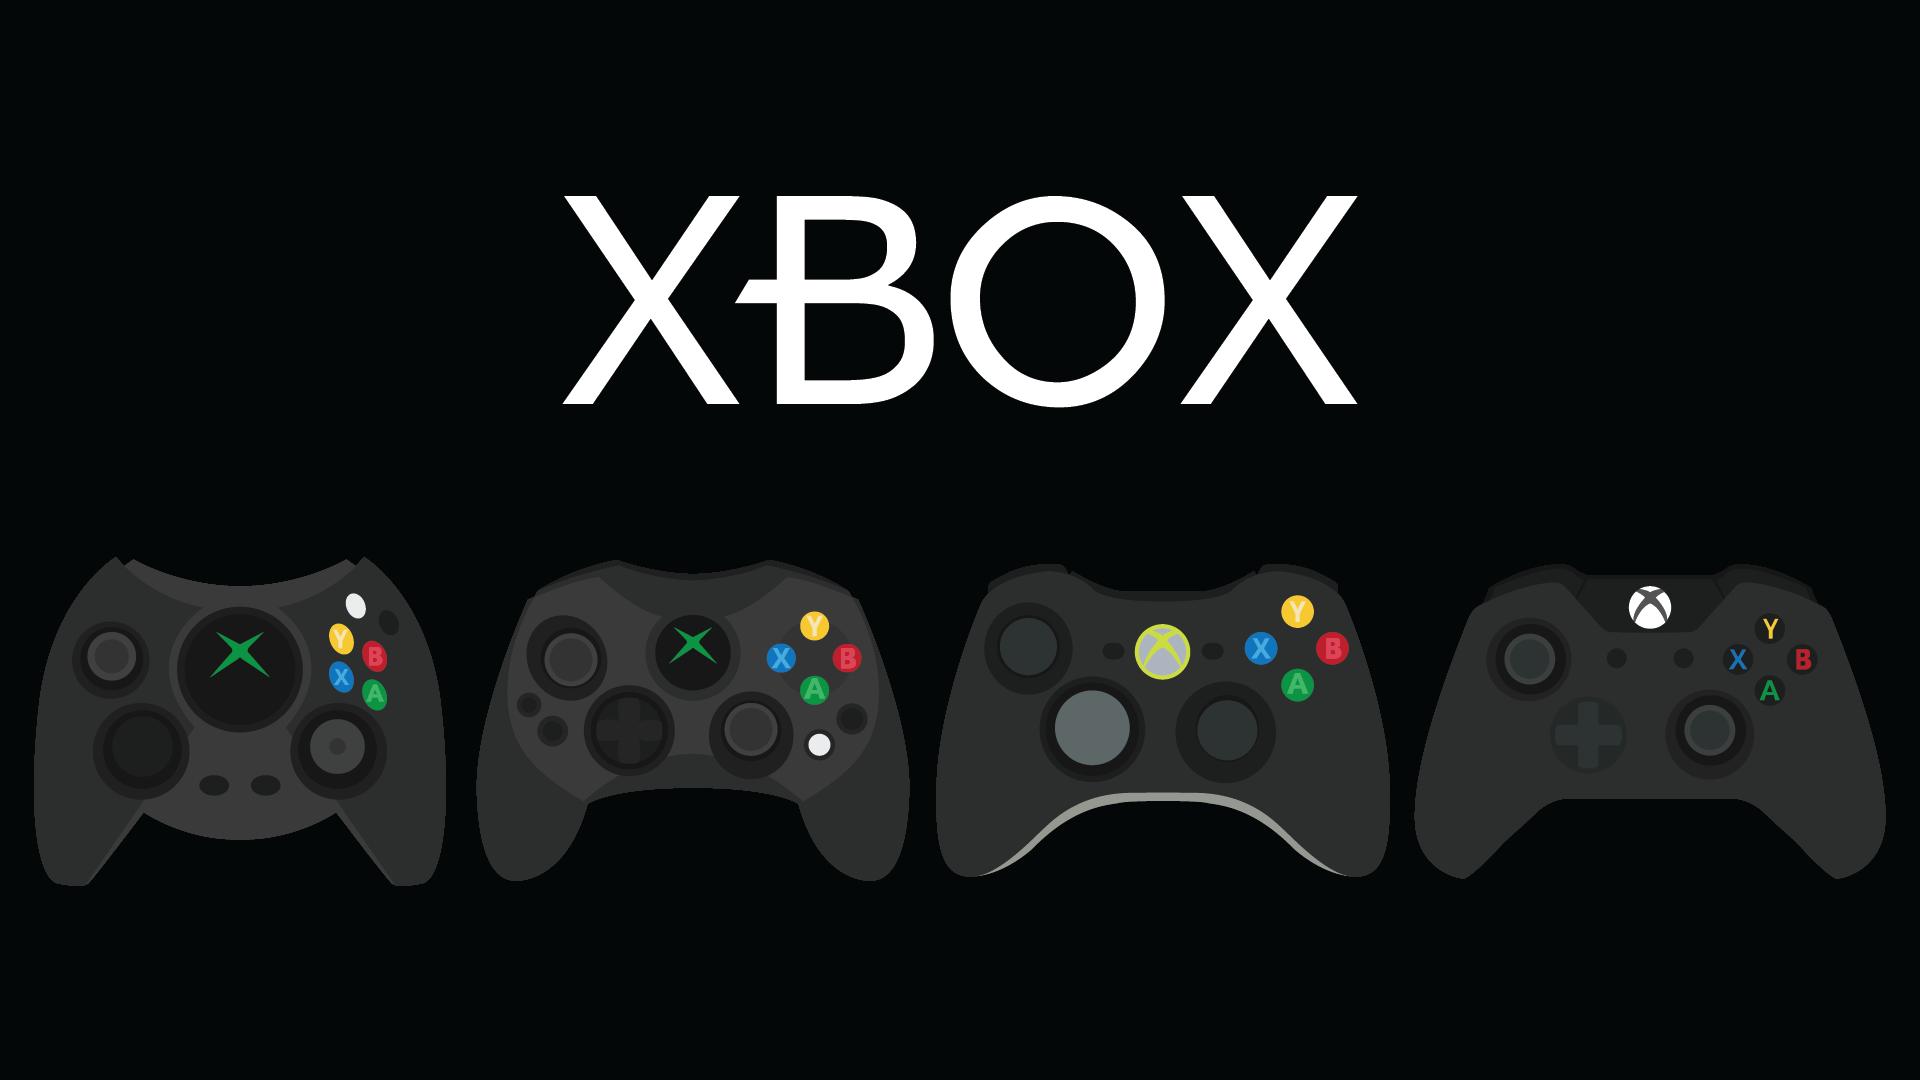 Xbox Controller Wallpaper 1920x1080 iimgurcom 1920x1080